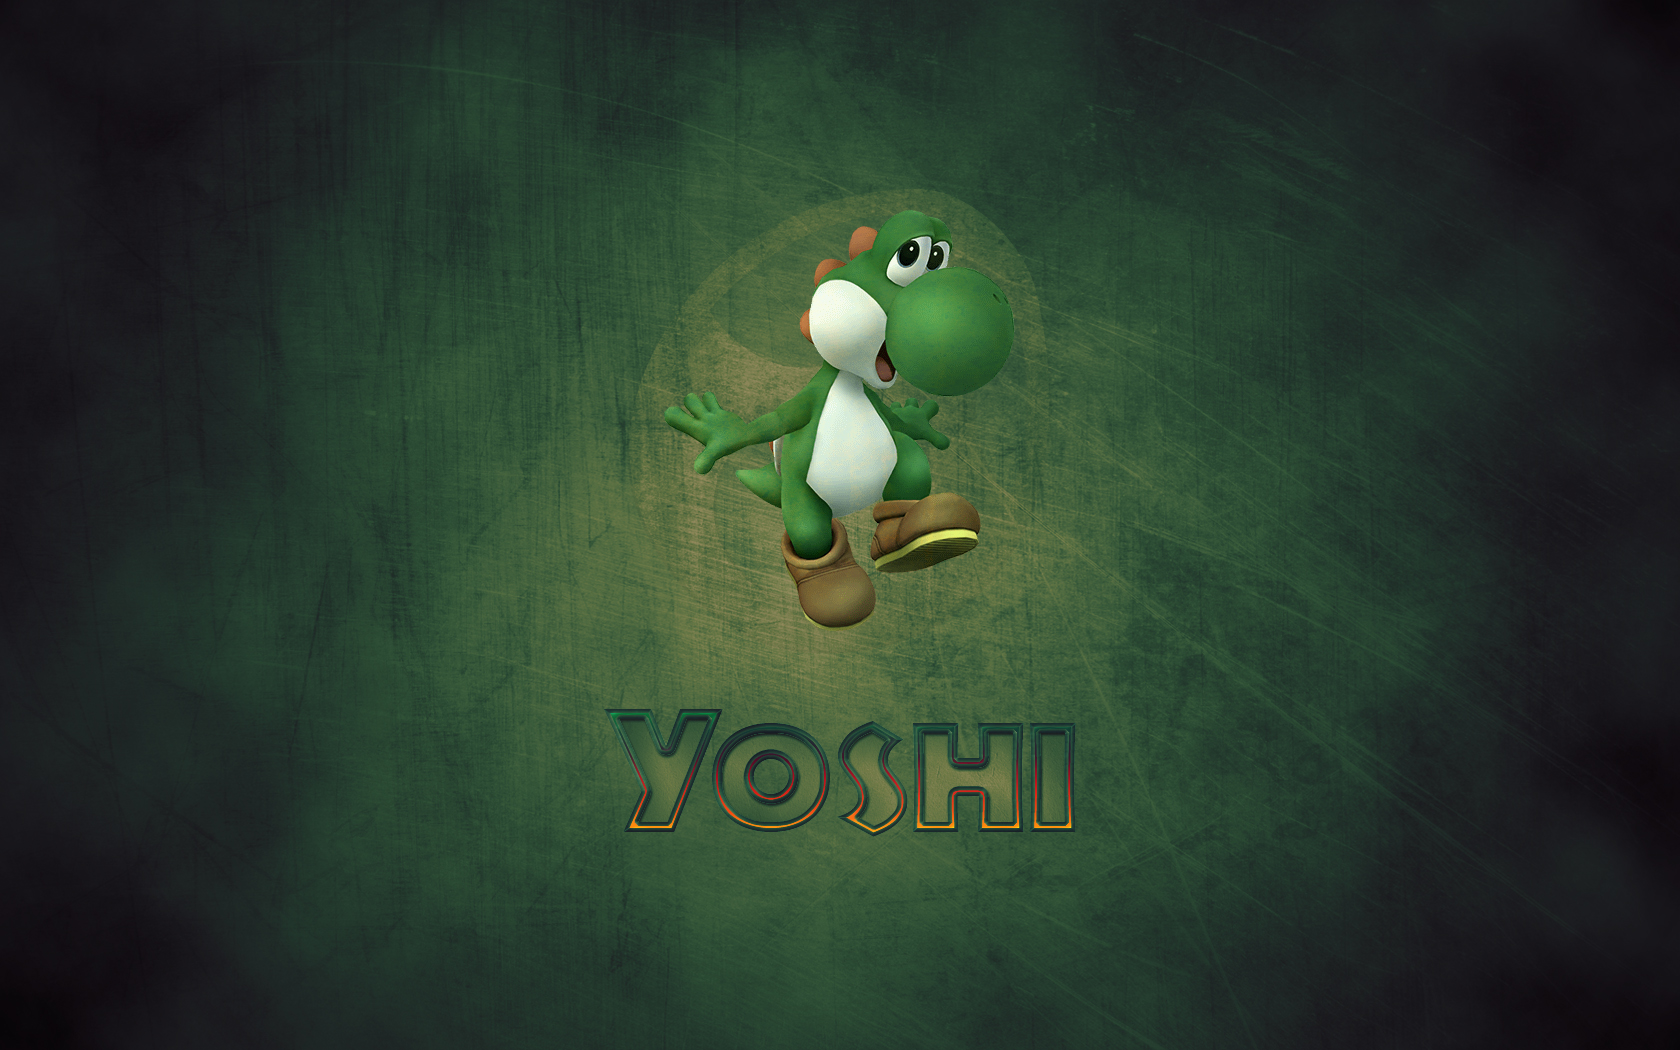 HD Yoshi Wallpaper - WallpaperSafari